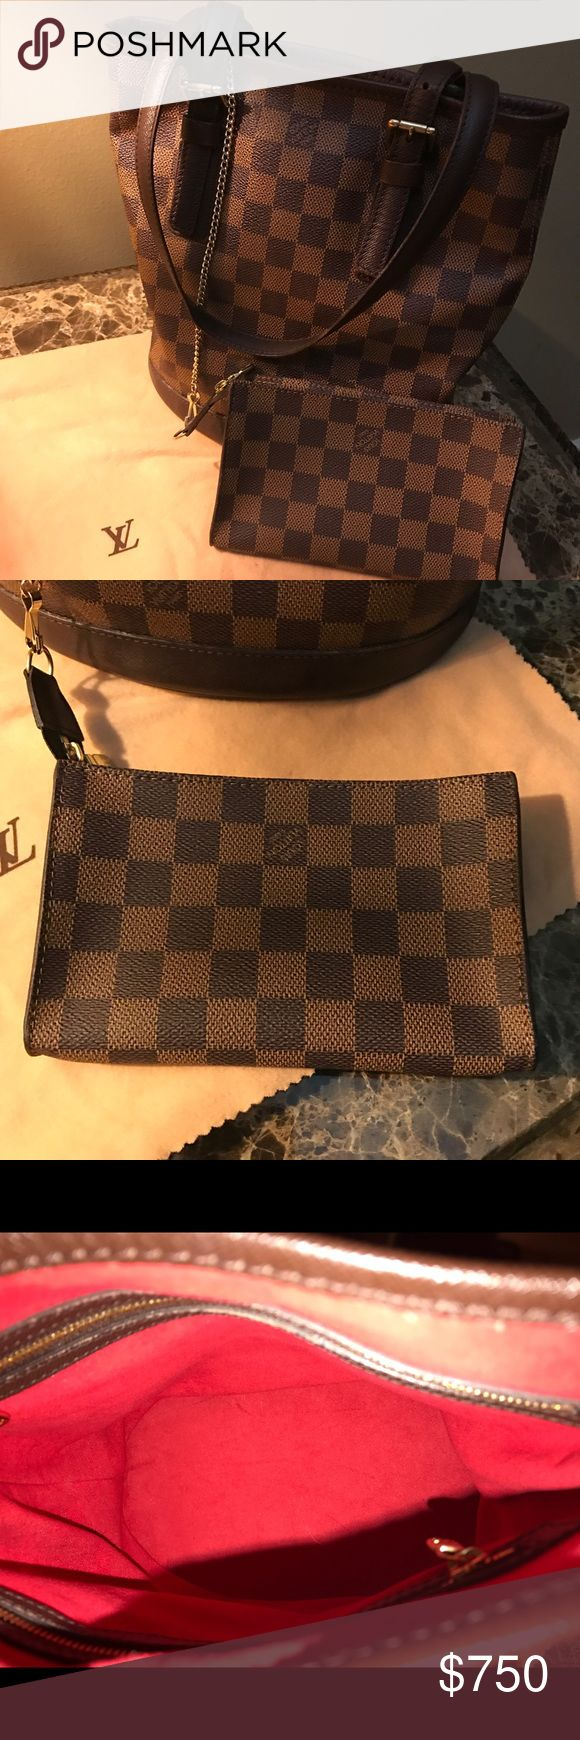 Louis Vuitton Damier Ebene Bucket Bag Pristine Condition! With Dust Bag and Pouchette. Date Code:DK0124. Like new! Louis Vuitton Bags Shoulder Bags